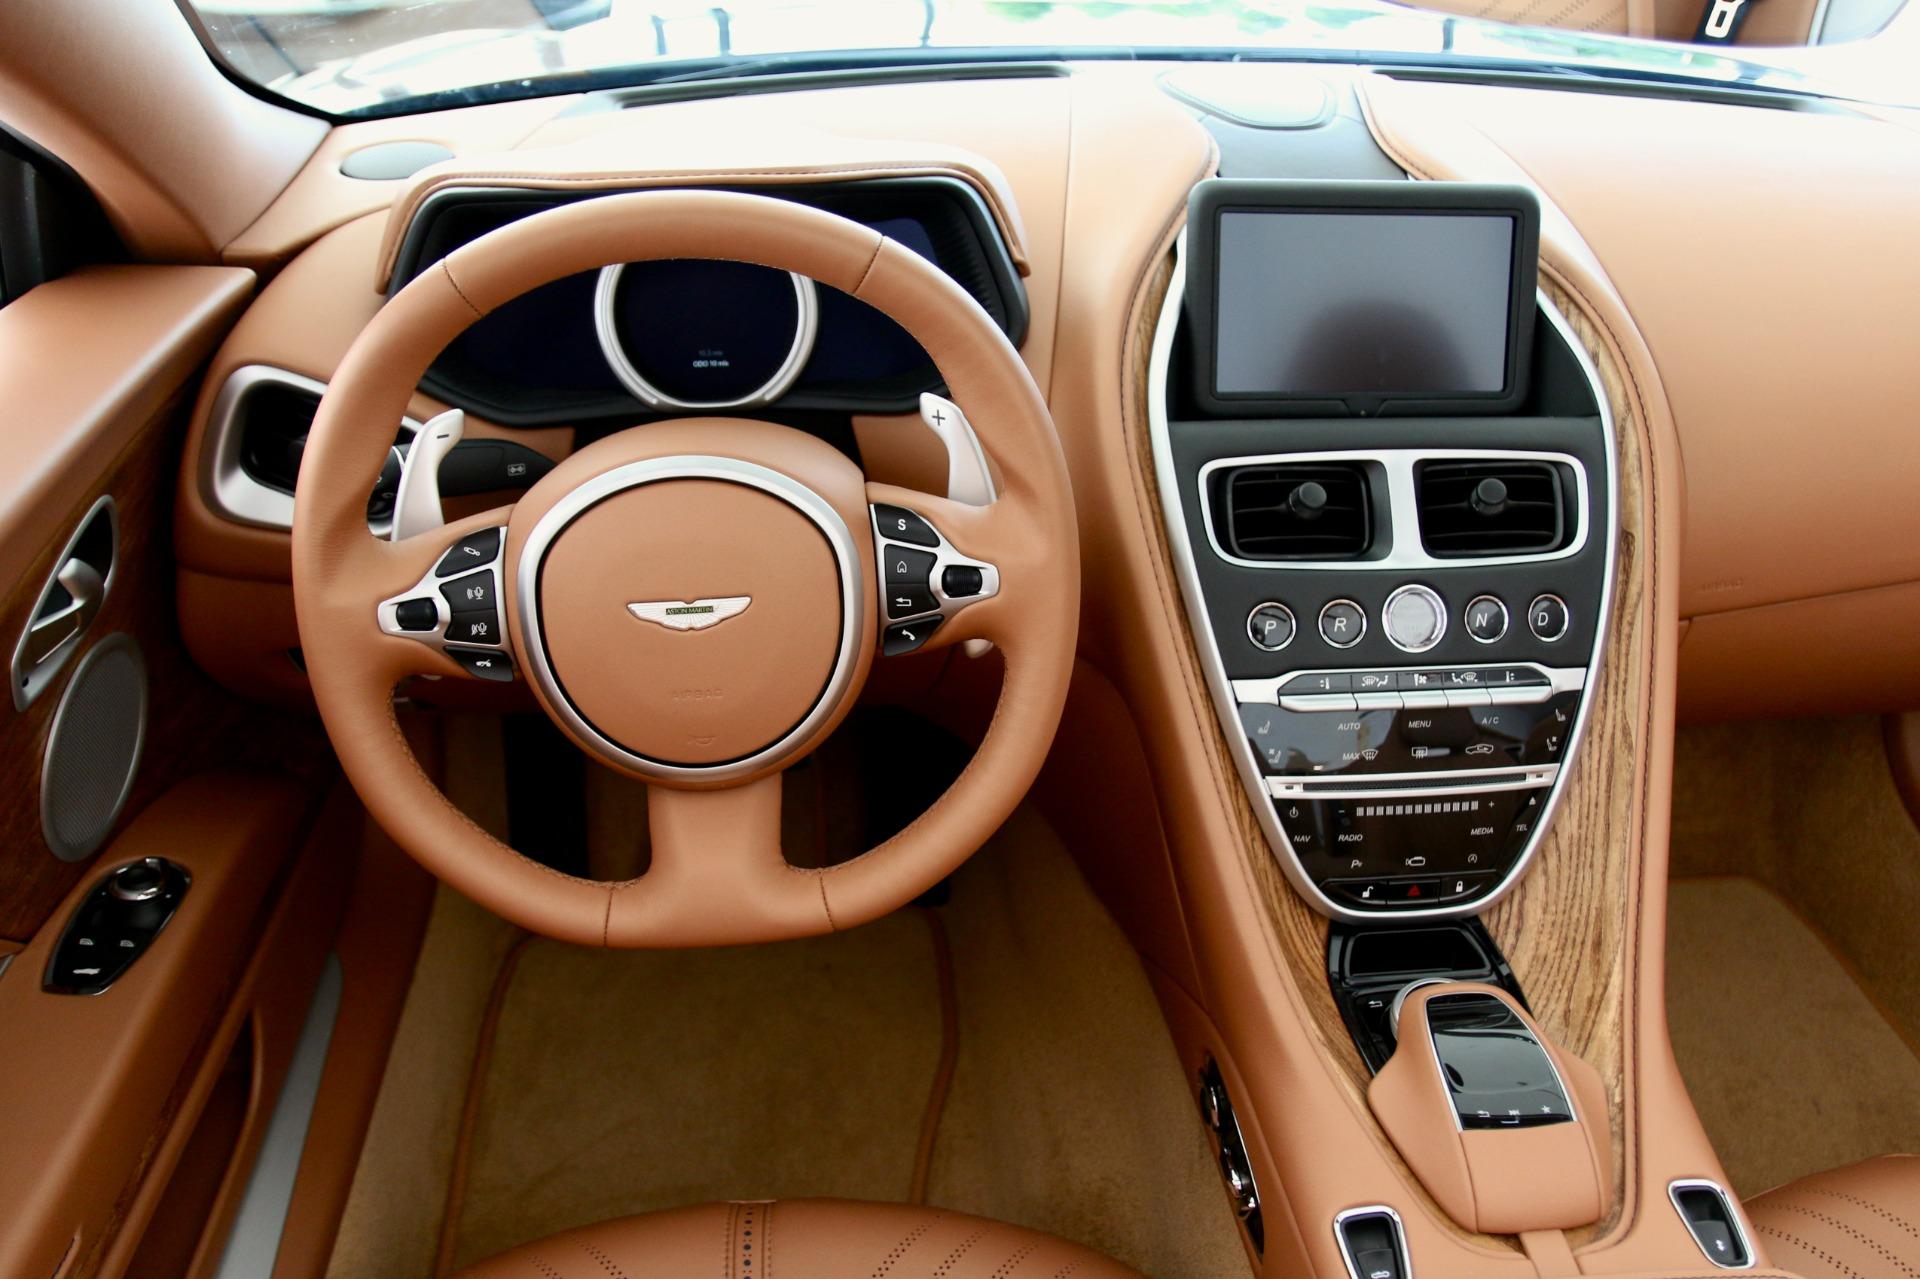 2019 Aston Martin Db11 Volante Stock 9nm06056 For Sale Near Vienna